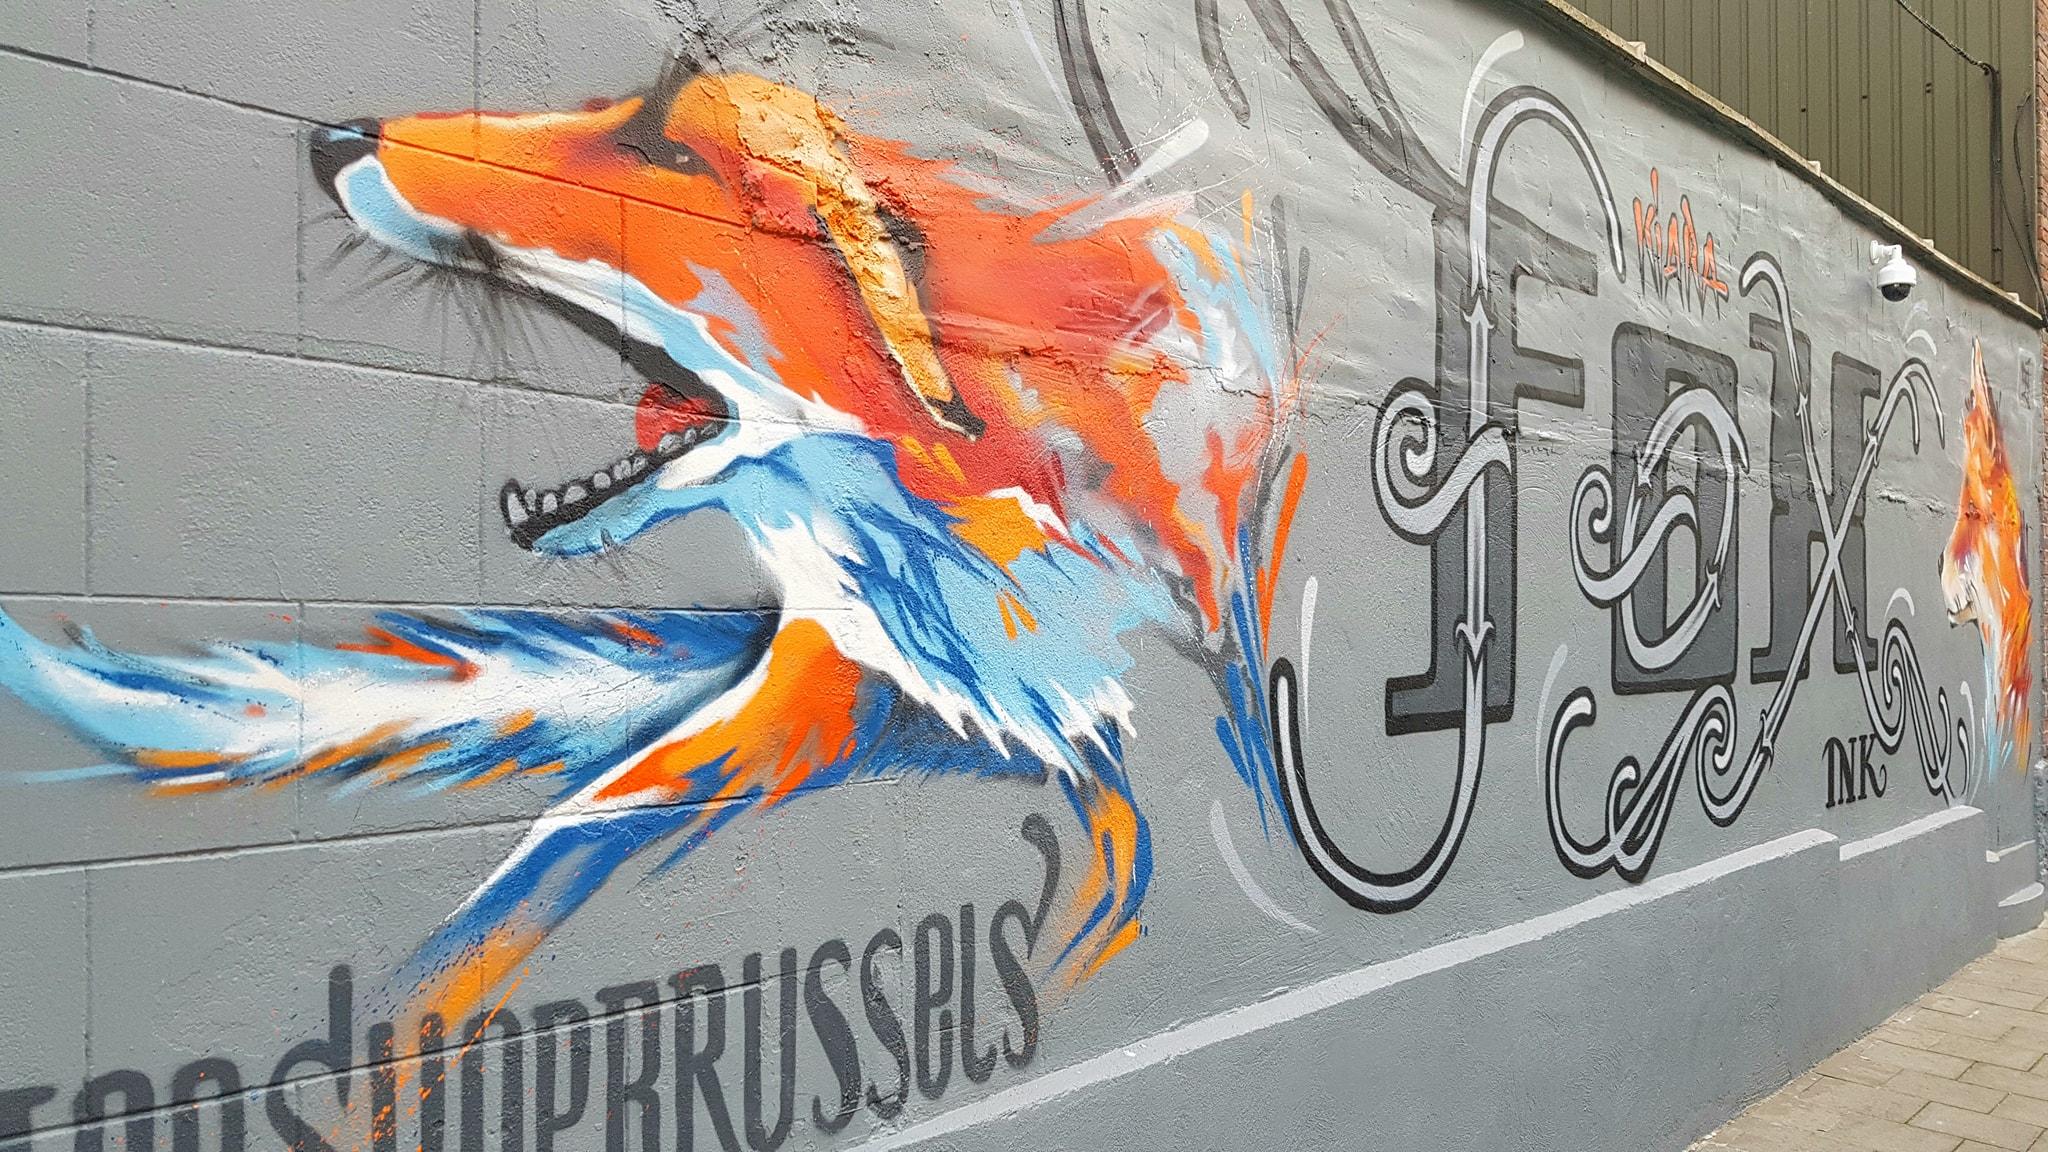 https://www.propaganza.be/wp-content/uploads/2019/04/Orkez-propaganza-urban-artist-graffiti-graff-street-art-spray-painting-belgique-2.jpg